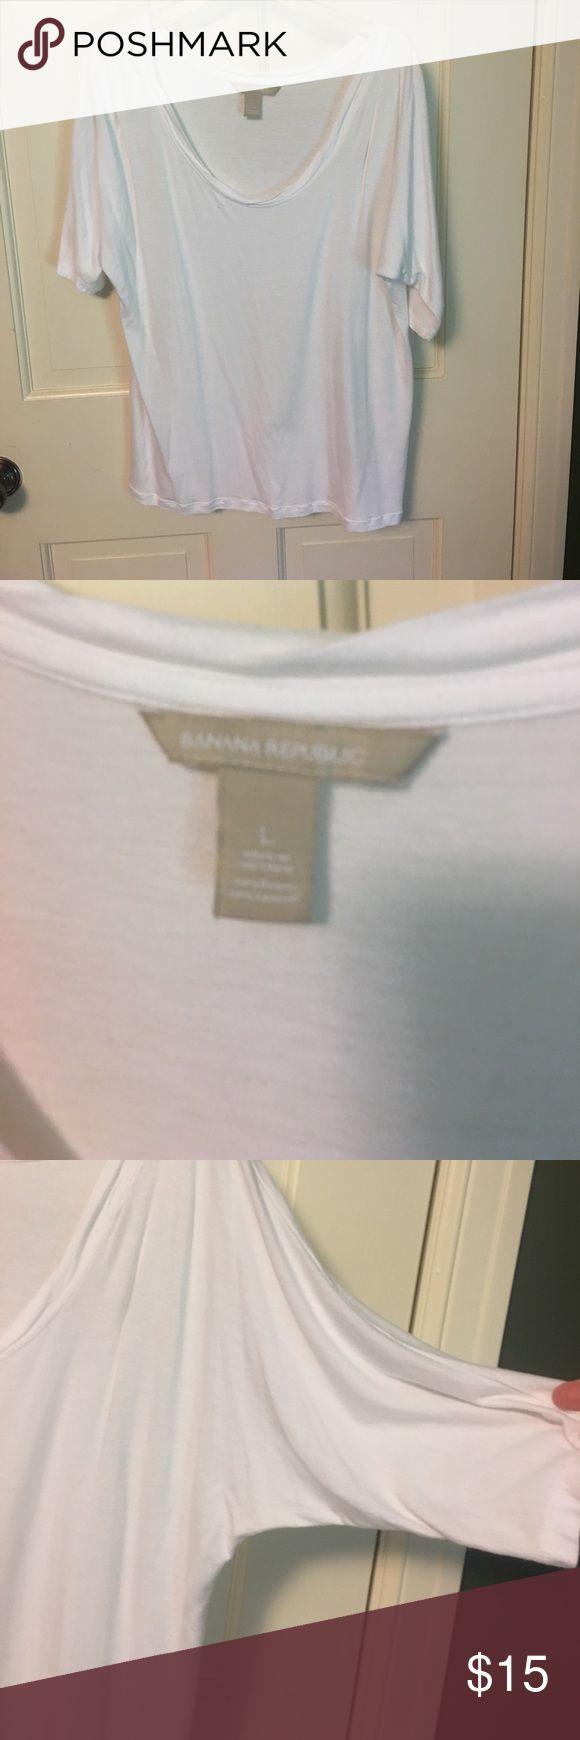 Banana Republic thin dressy tshirt size L Only worn twice, perfect for layering. Banana Republic Tops Tees - Short Sleeve